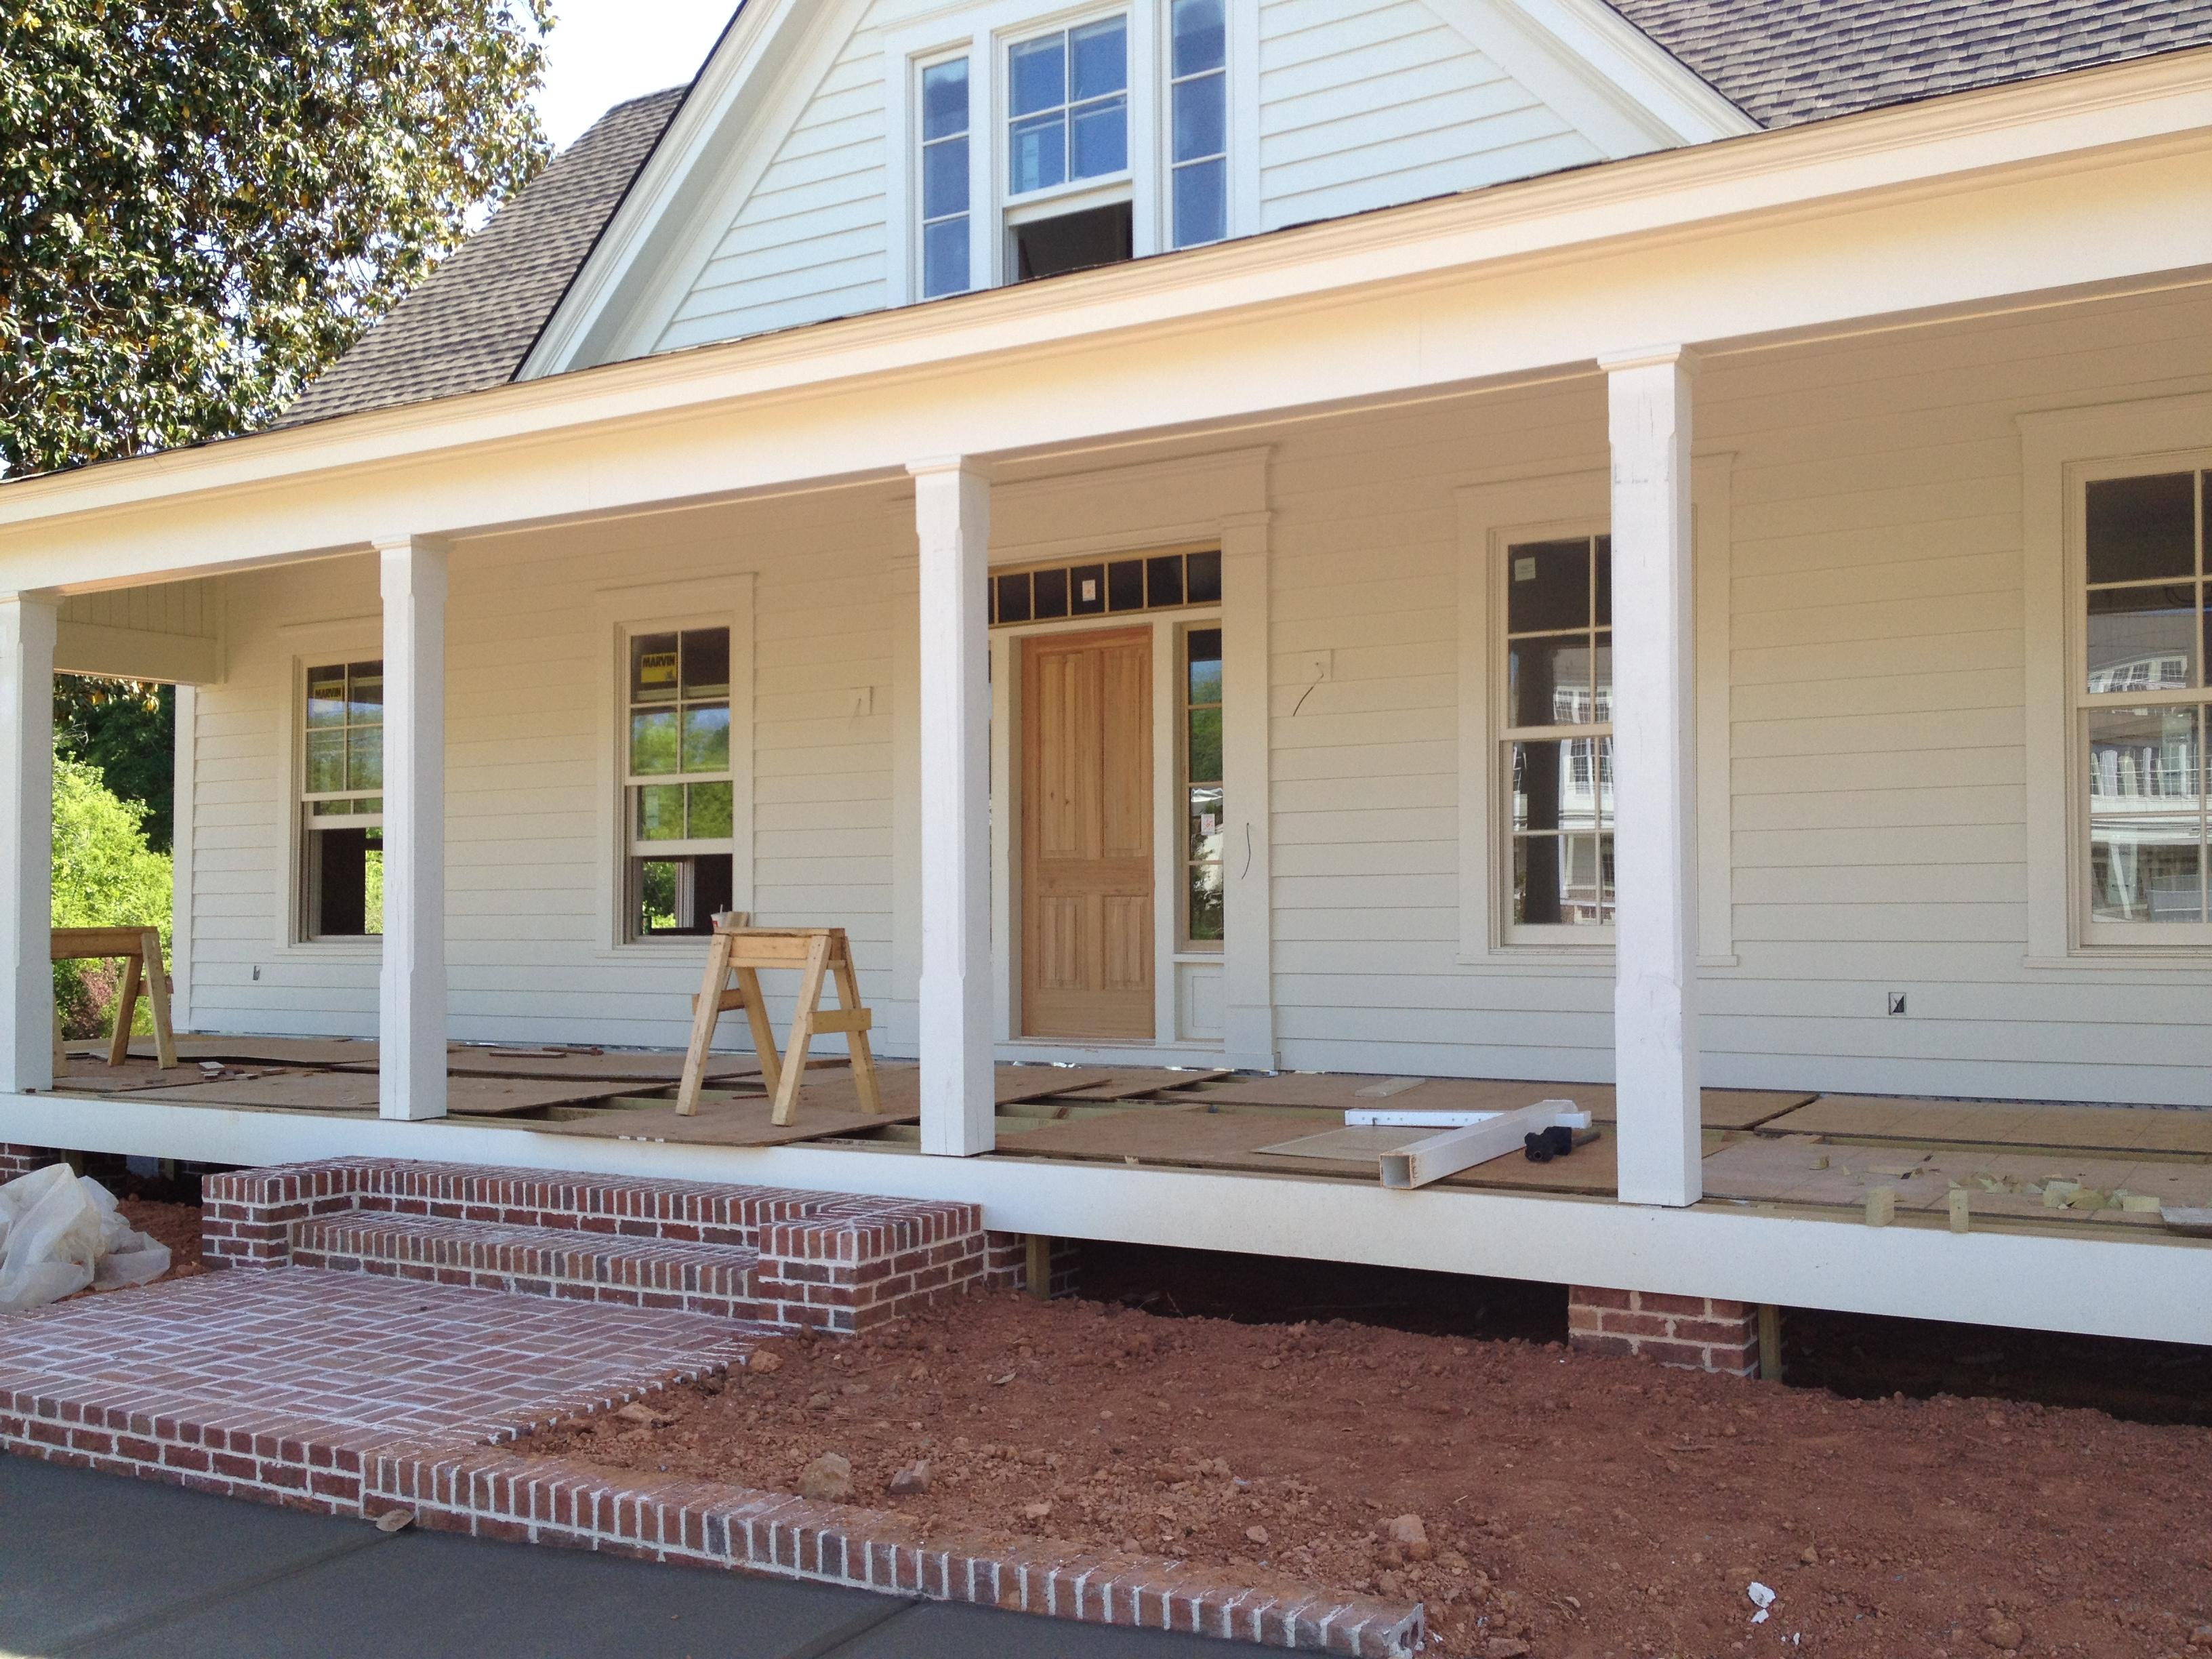 Southern living house plans farmhouse revival for Southern living house